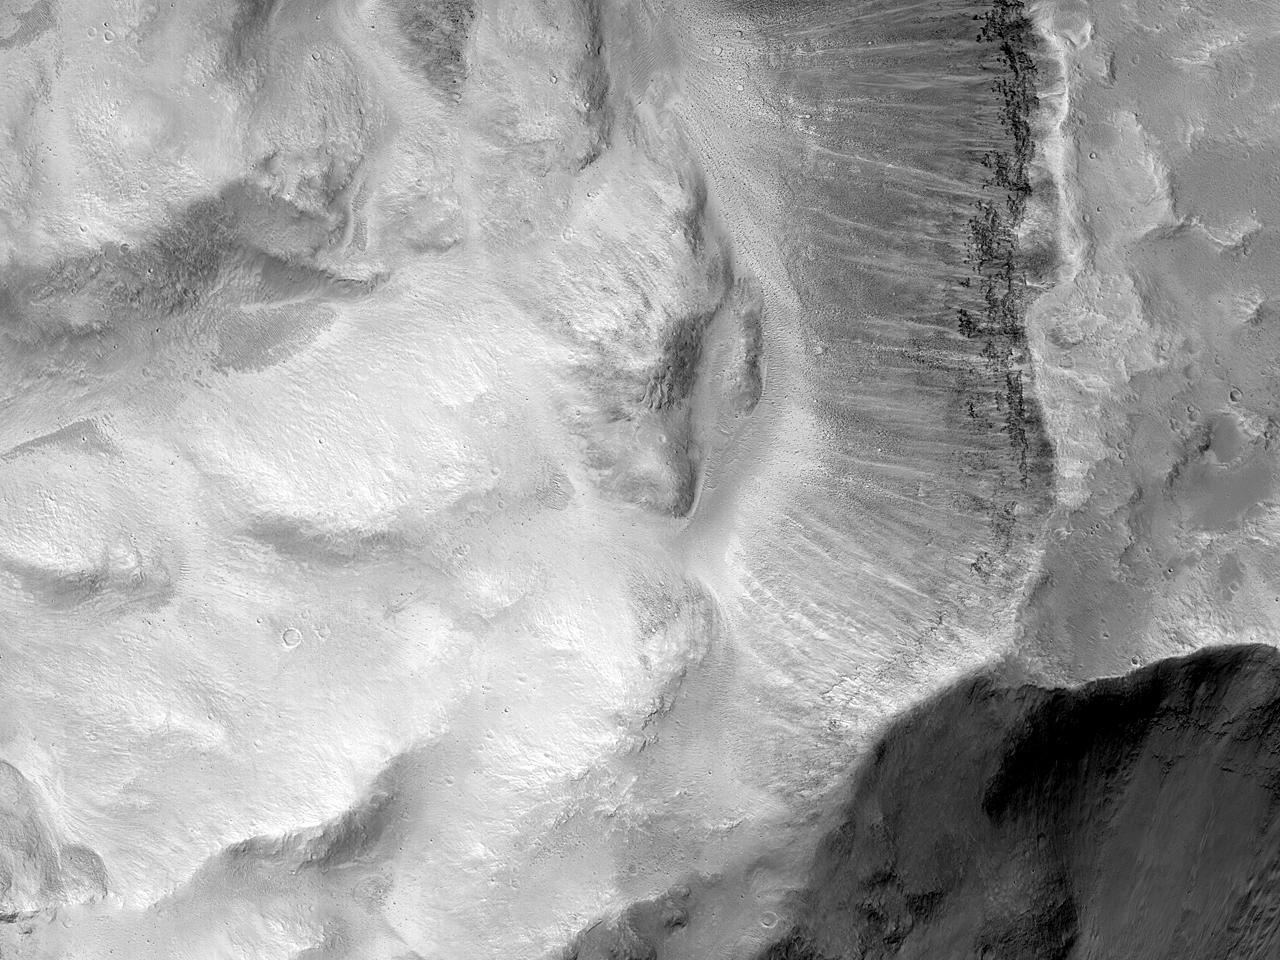 Panta unui crater în Tiu Valles